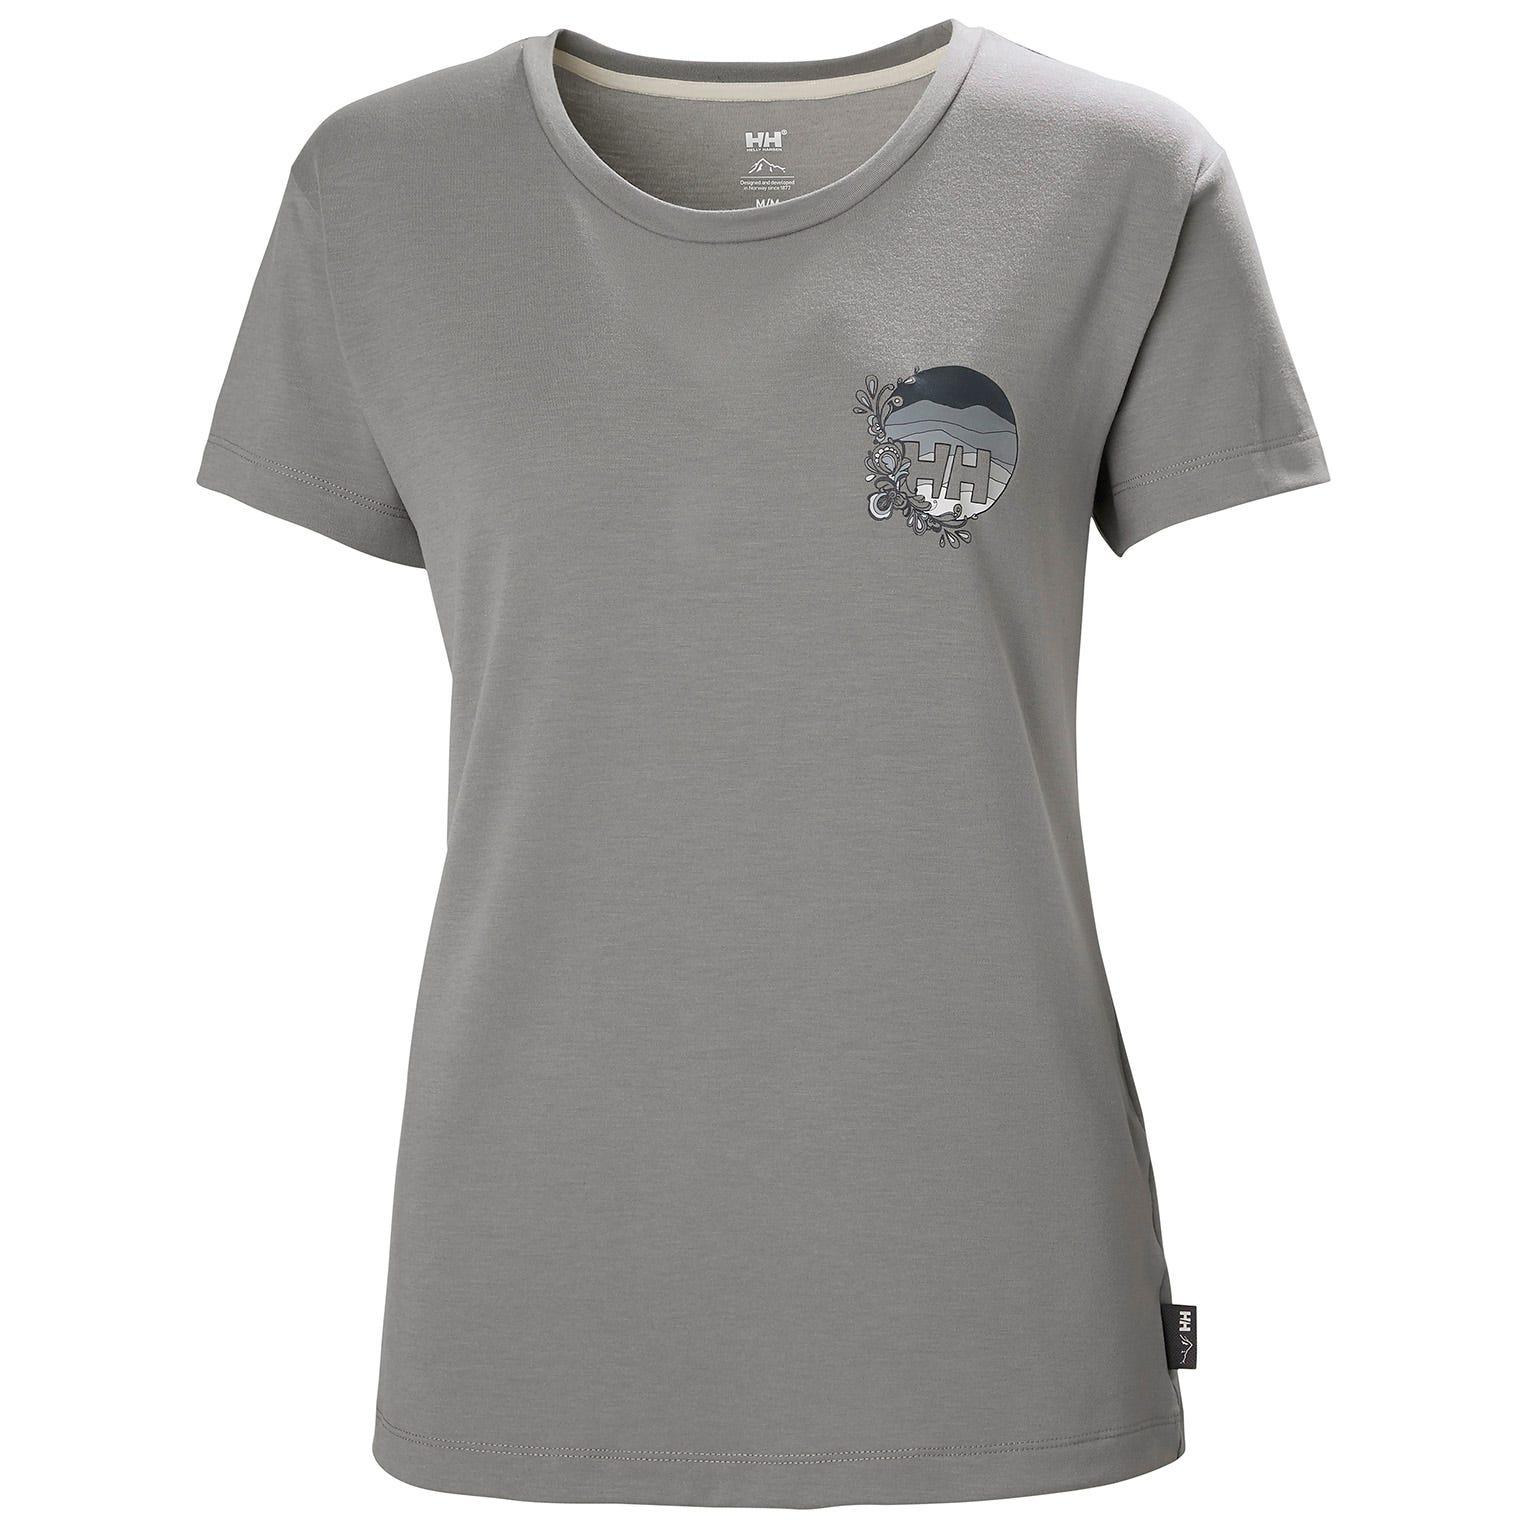 Helly Hansen Womens Skog Recycled Graphic Jersey Tshirt   S